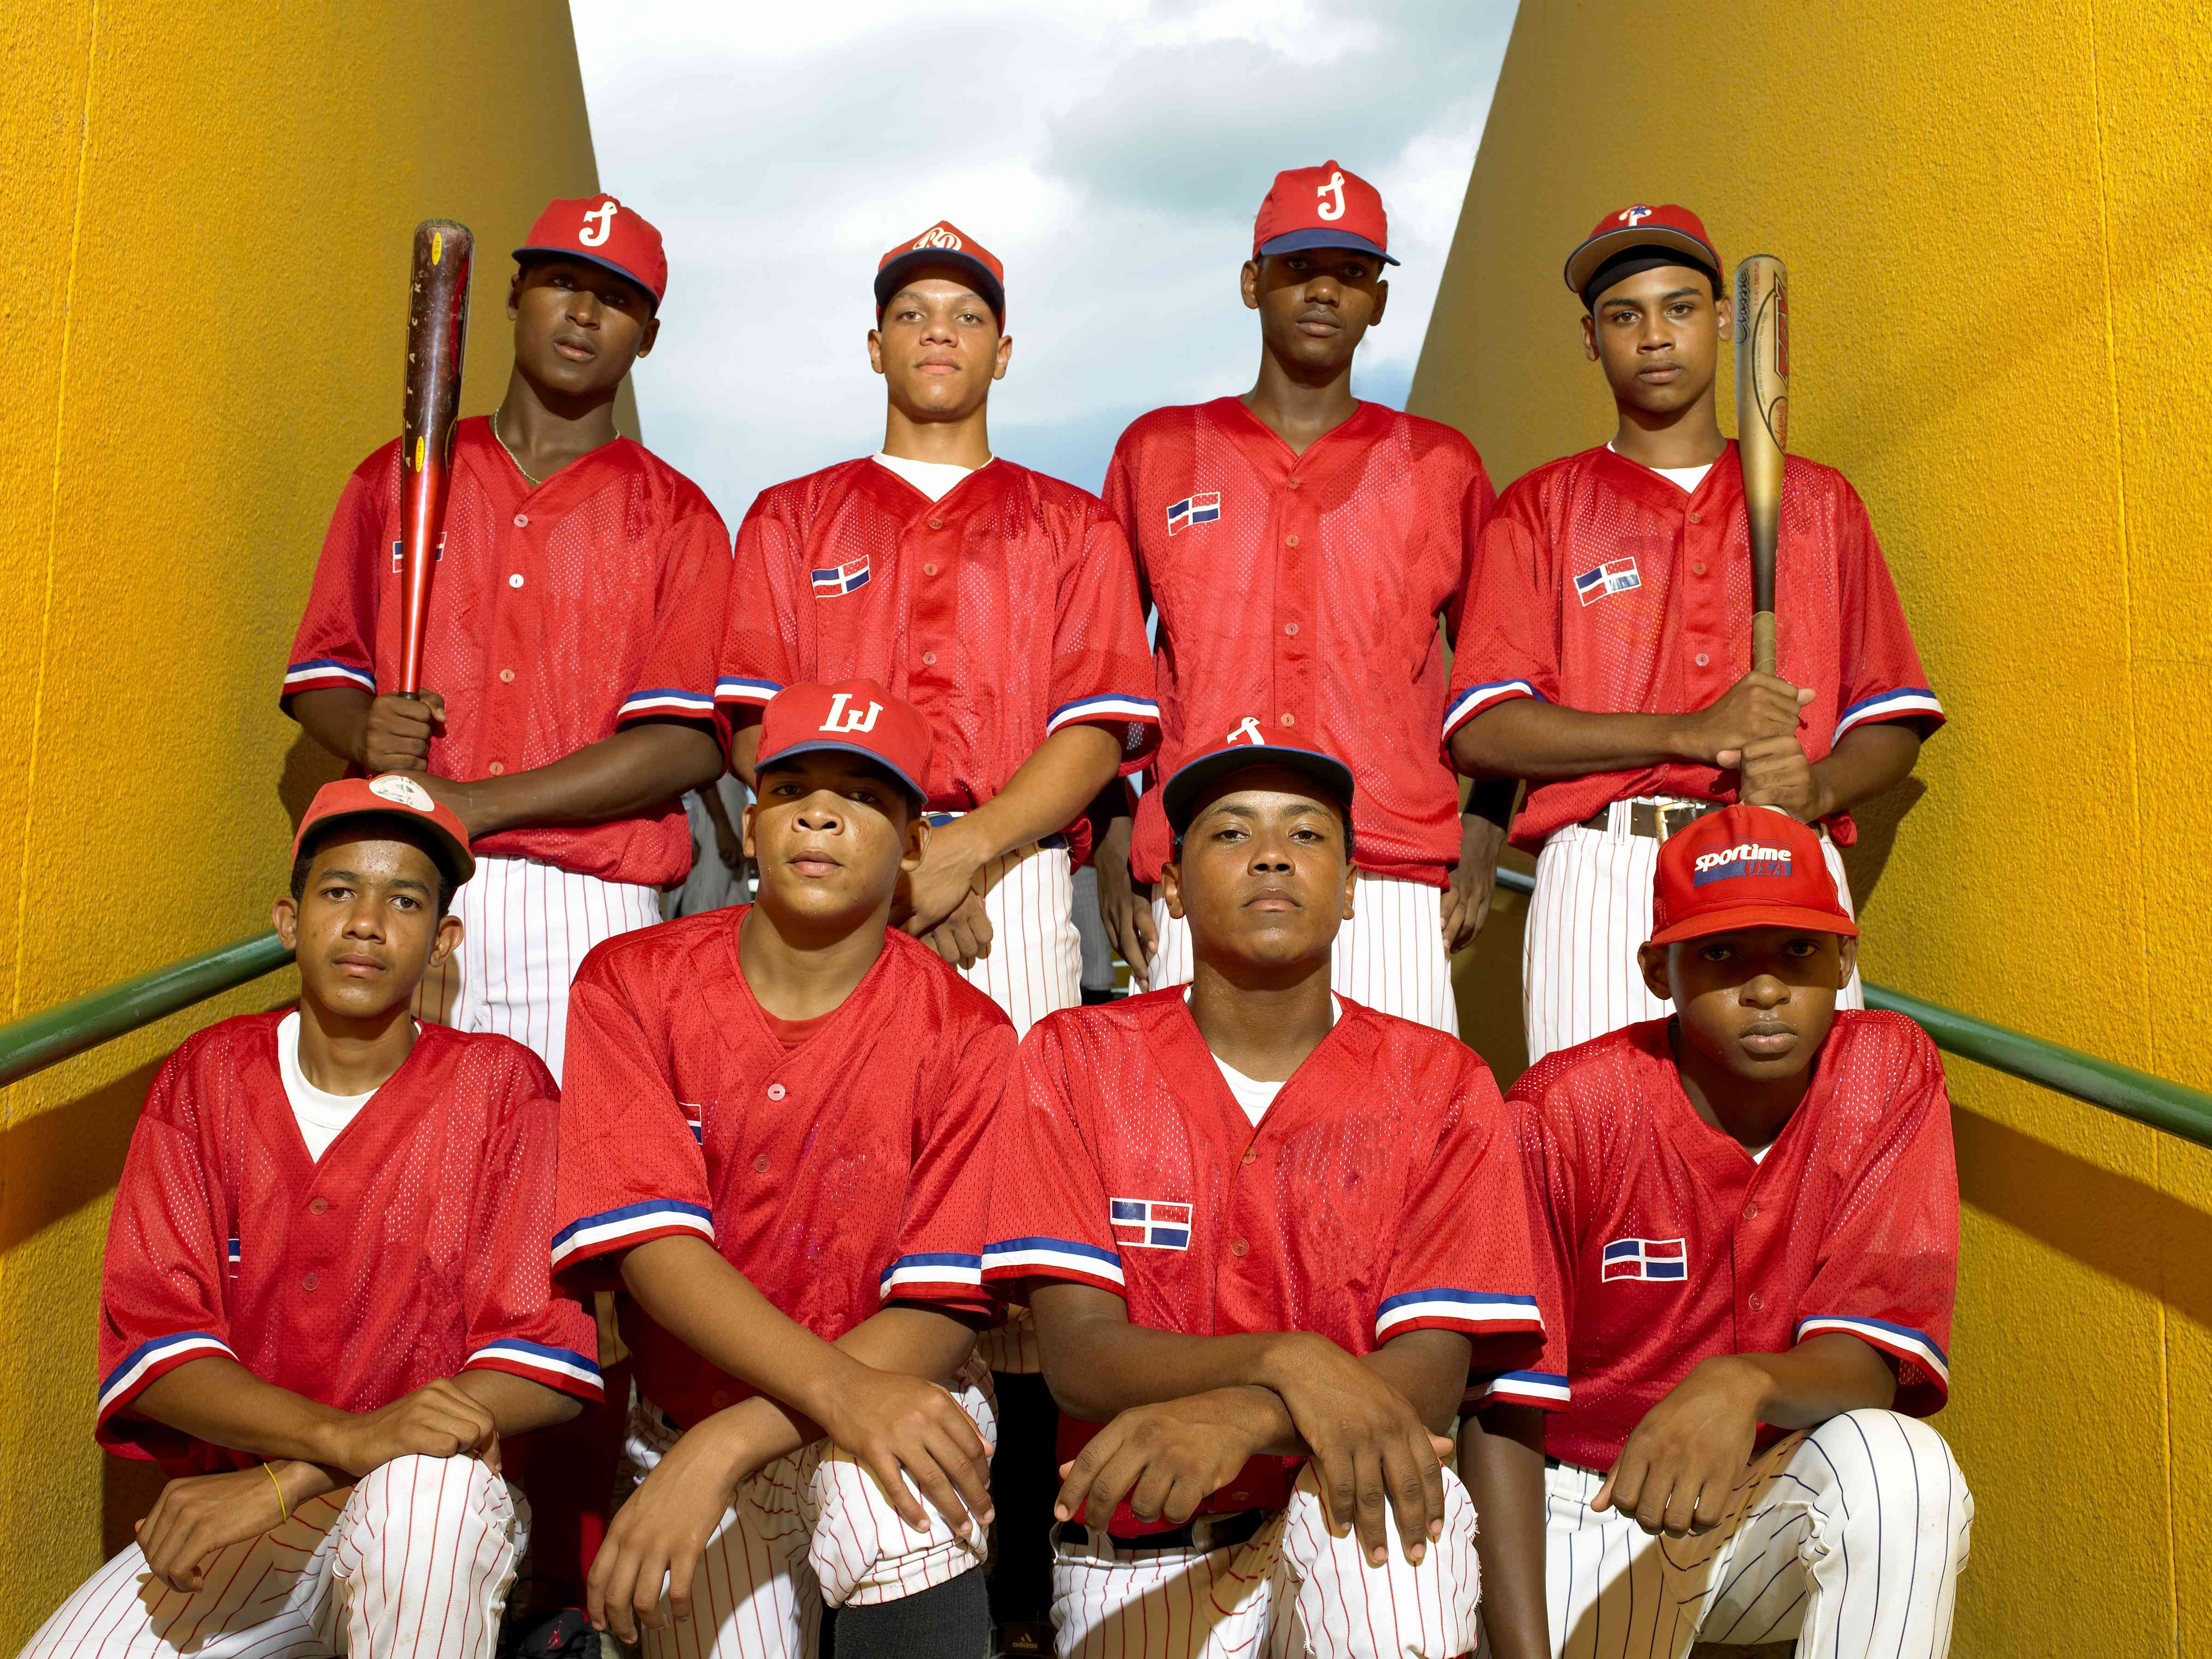 Dominican teenage baseball players